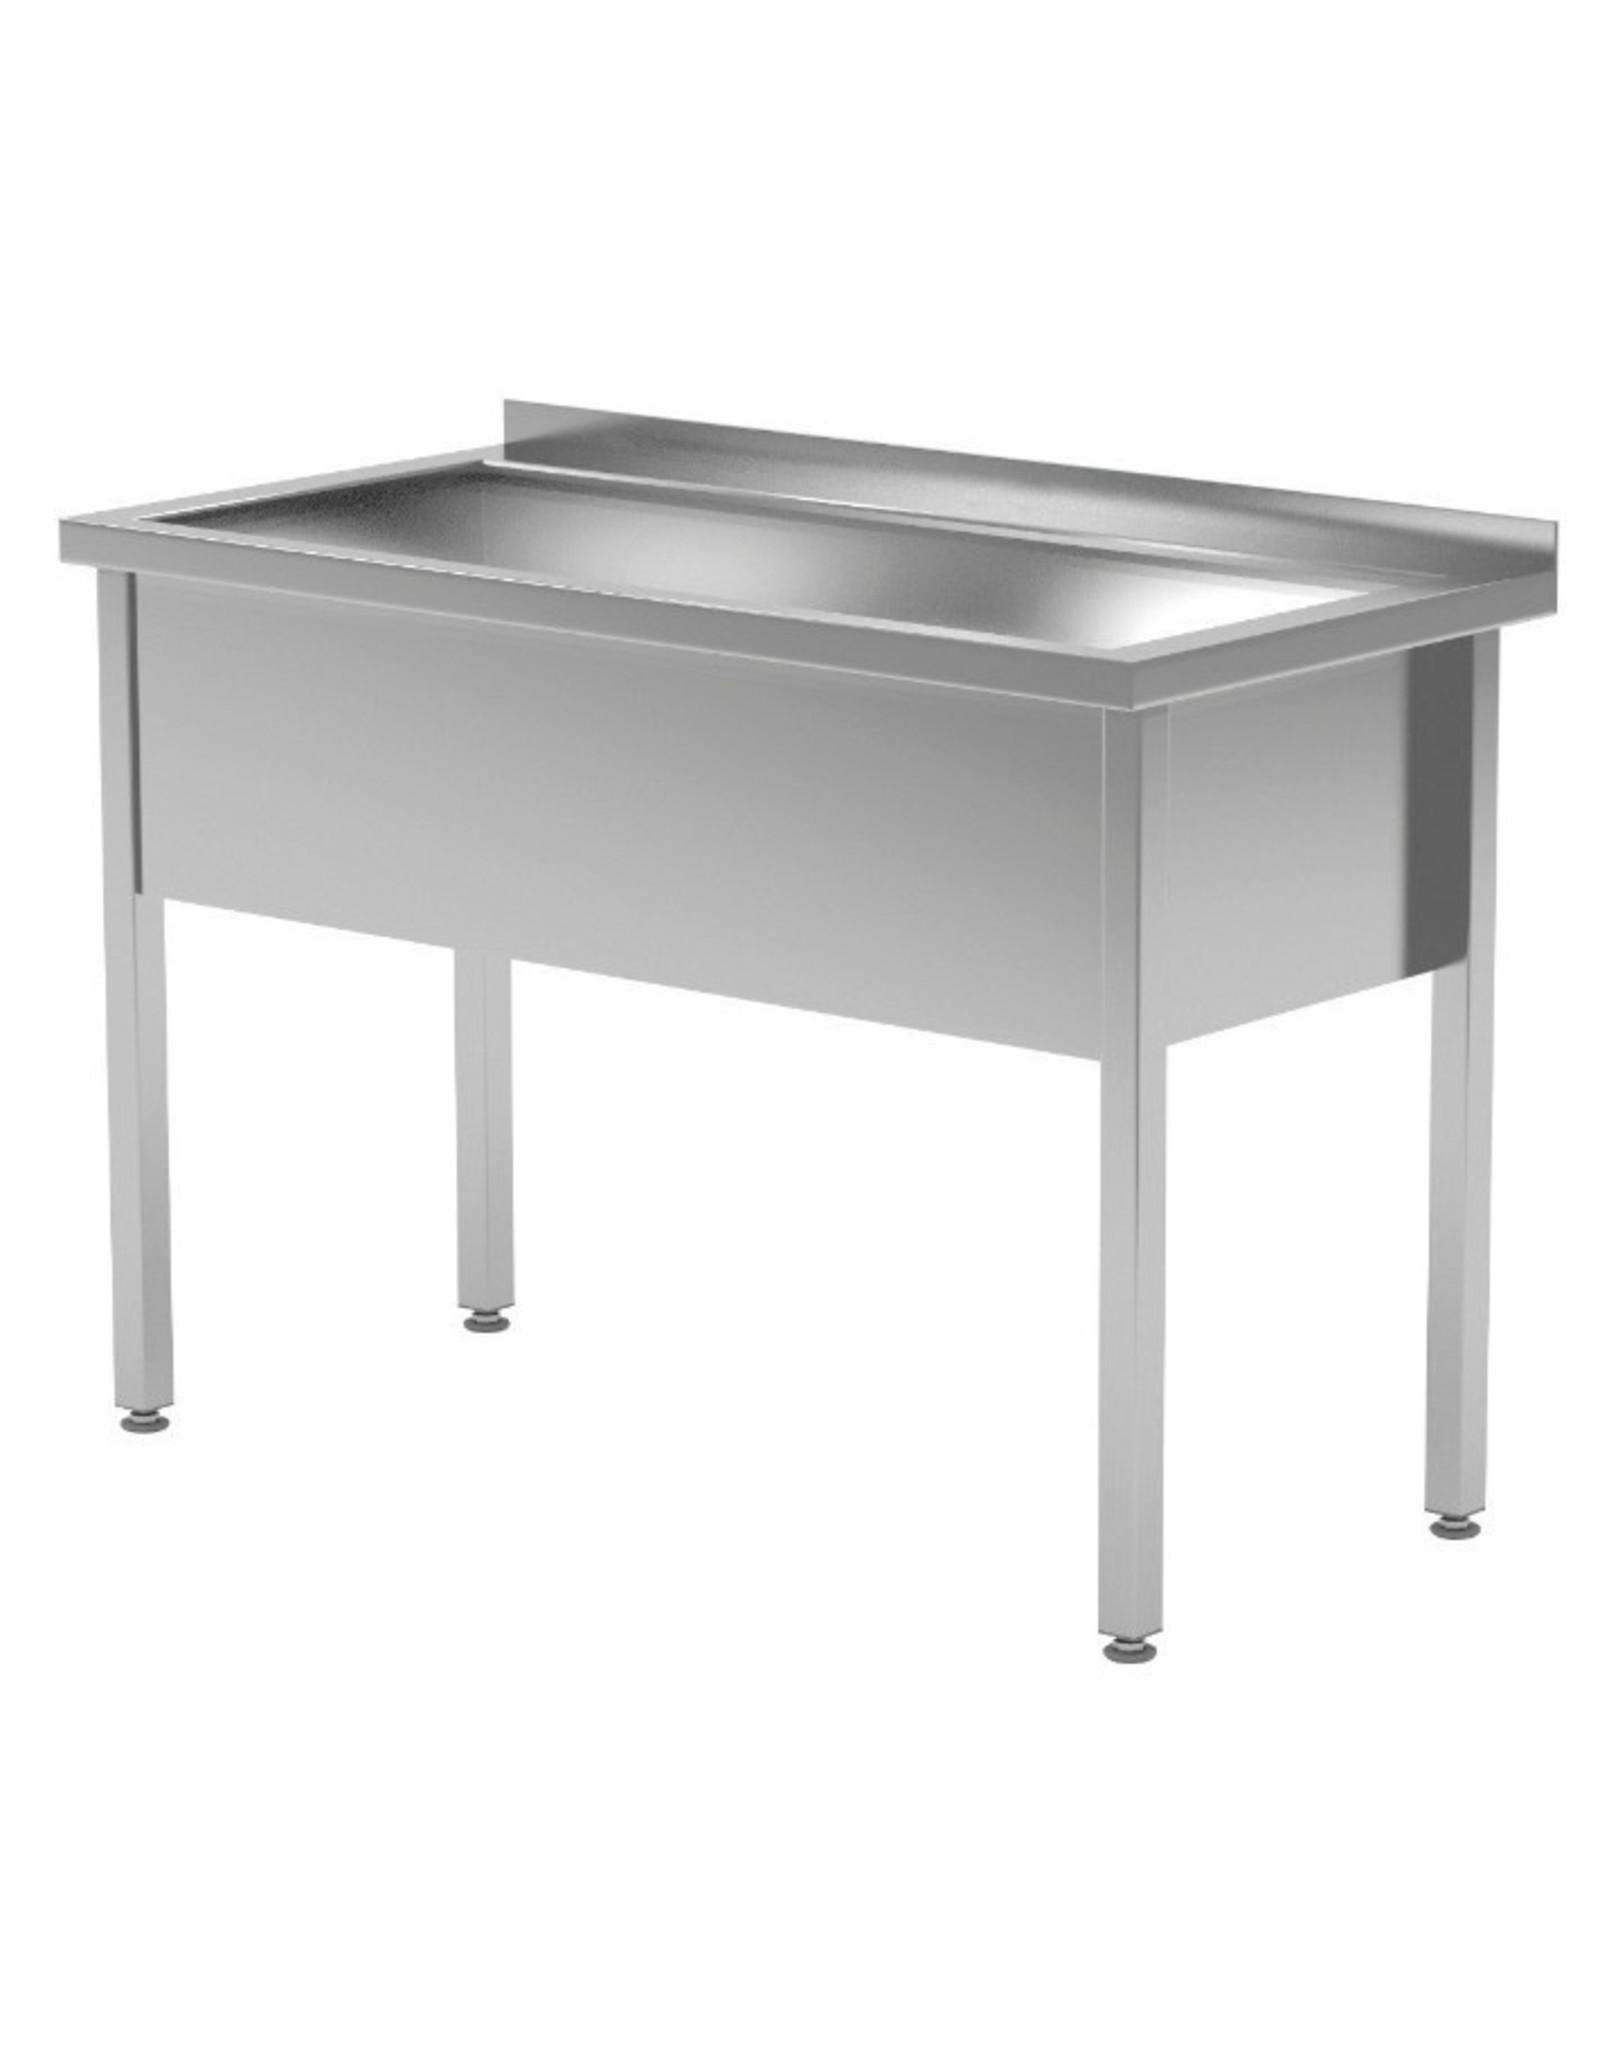 Grote wasbak tafel | 300mm diepte wasbak | 600-1200mm breed | 600 of 700mm diep